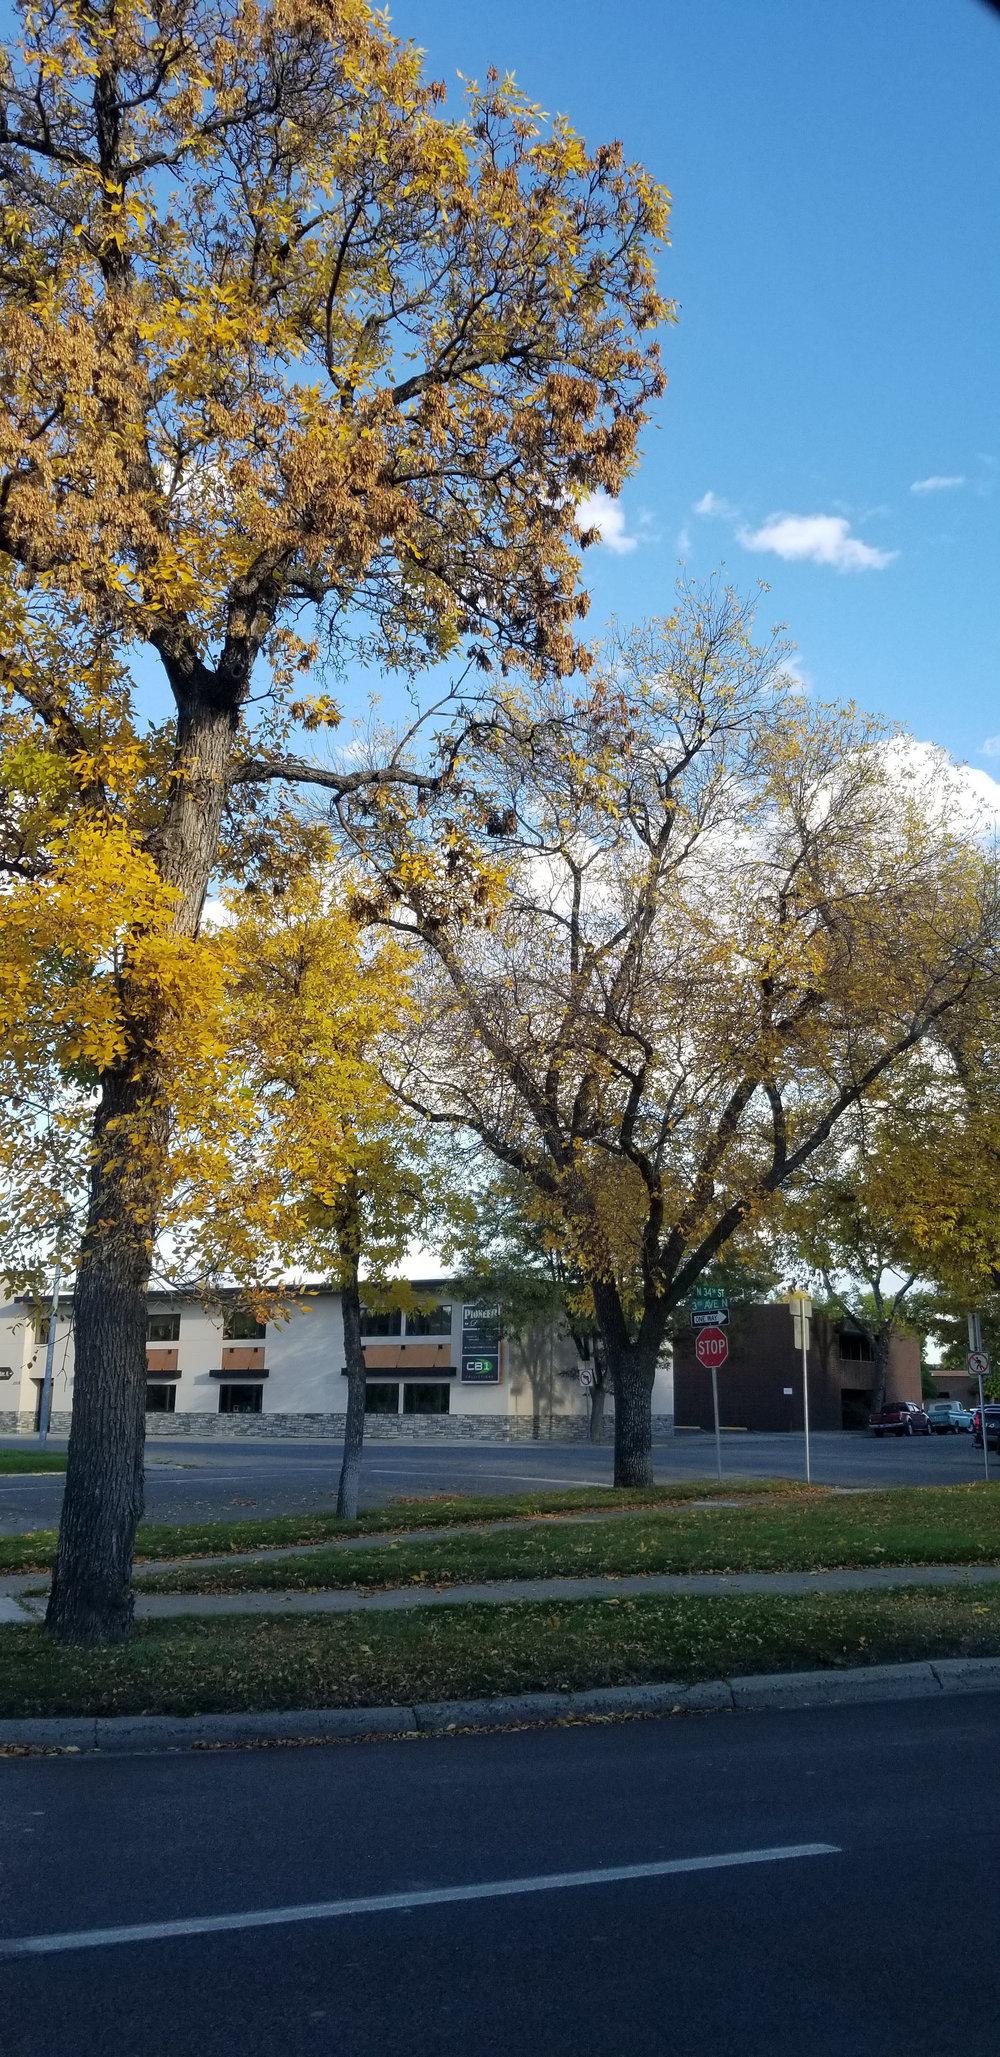 Beautiful falls street colors in Billings, Montana. Leaves fall in autumn